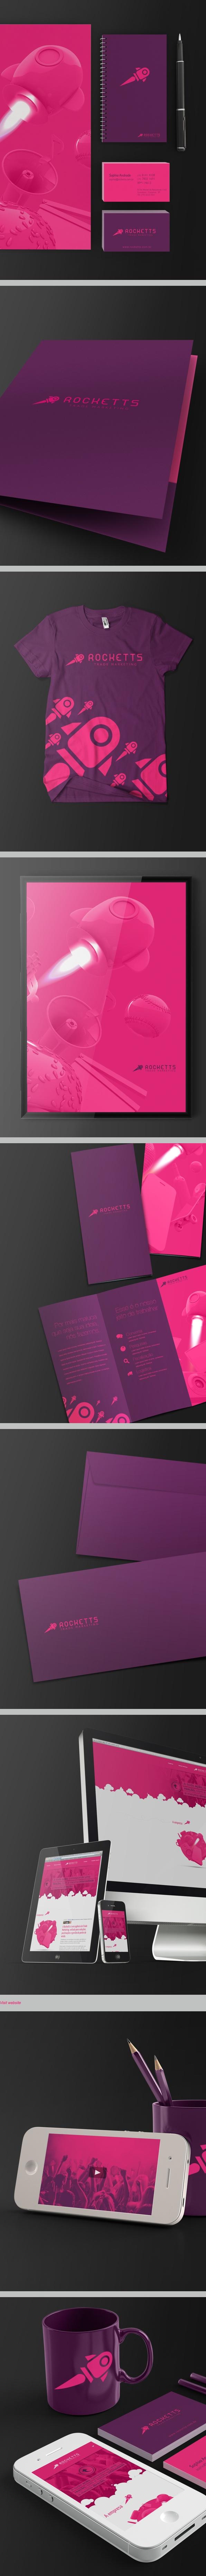 #Design #corporate #identity #branding #visual